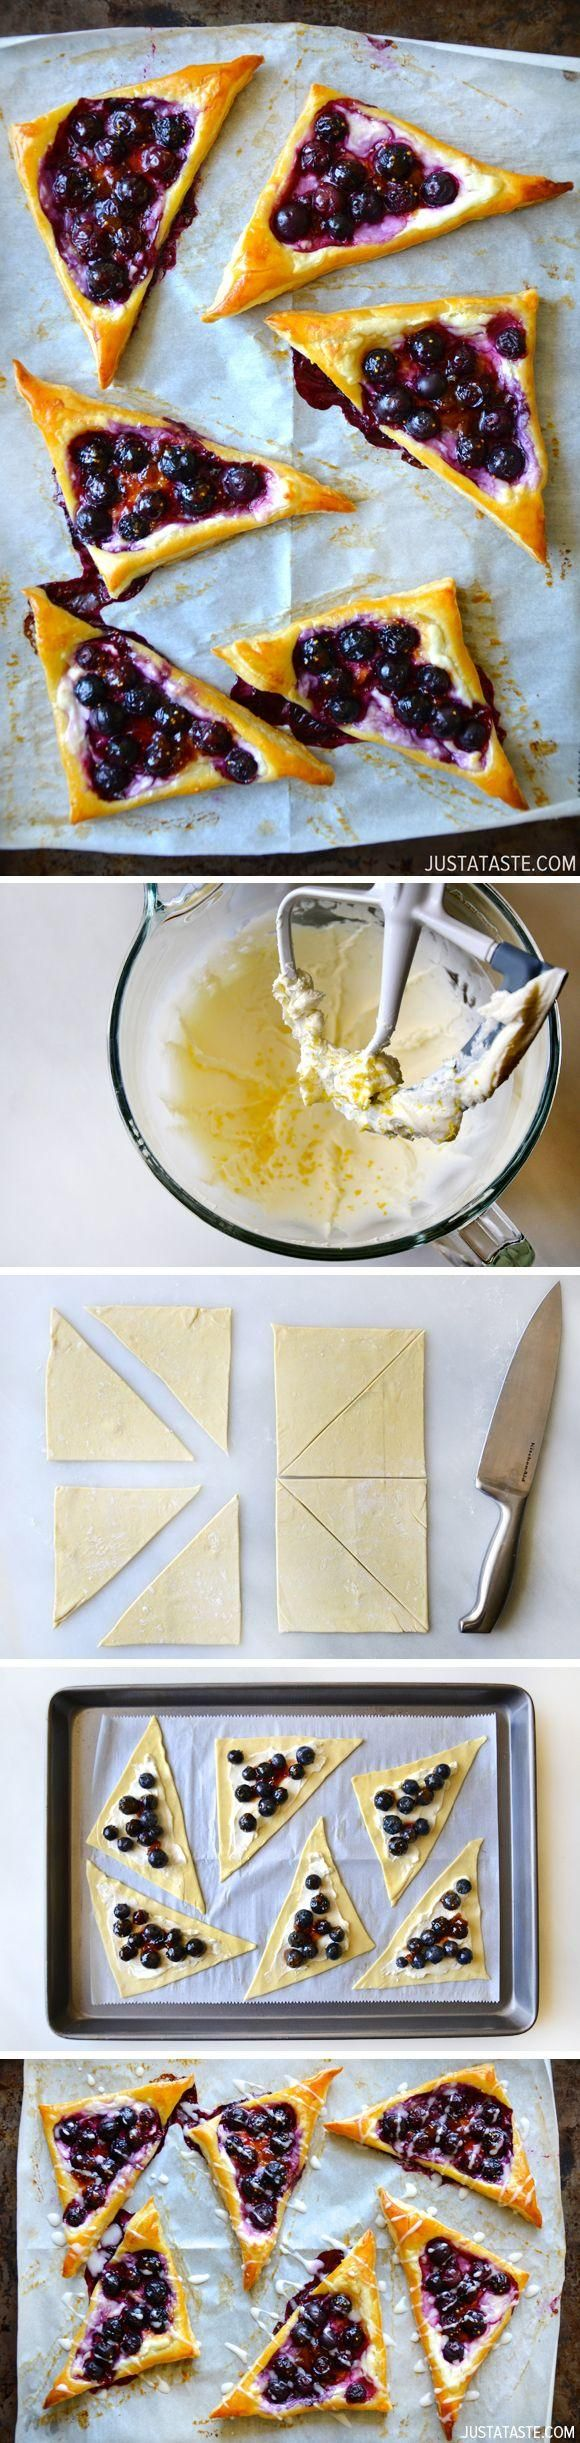 Blueberry Cream Cheese Pastrie